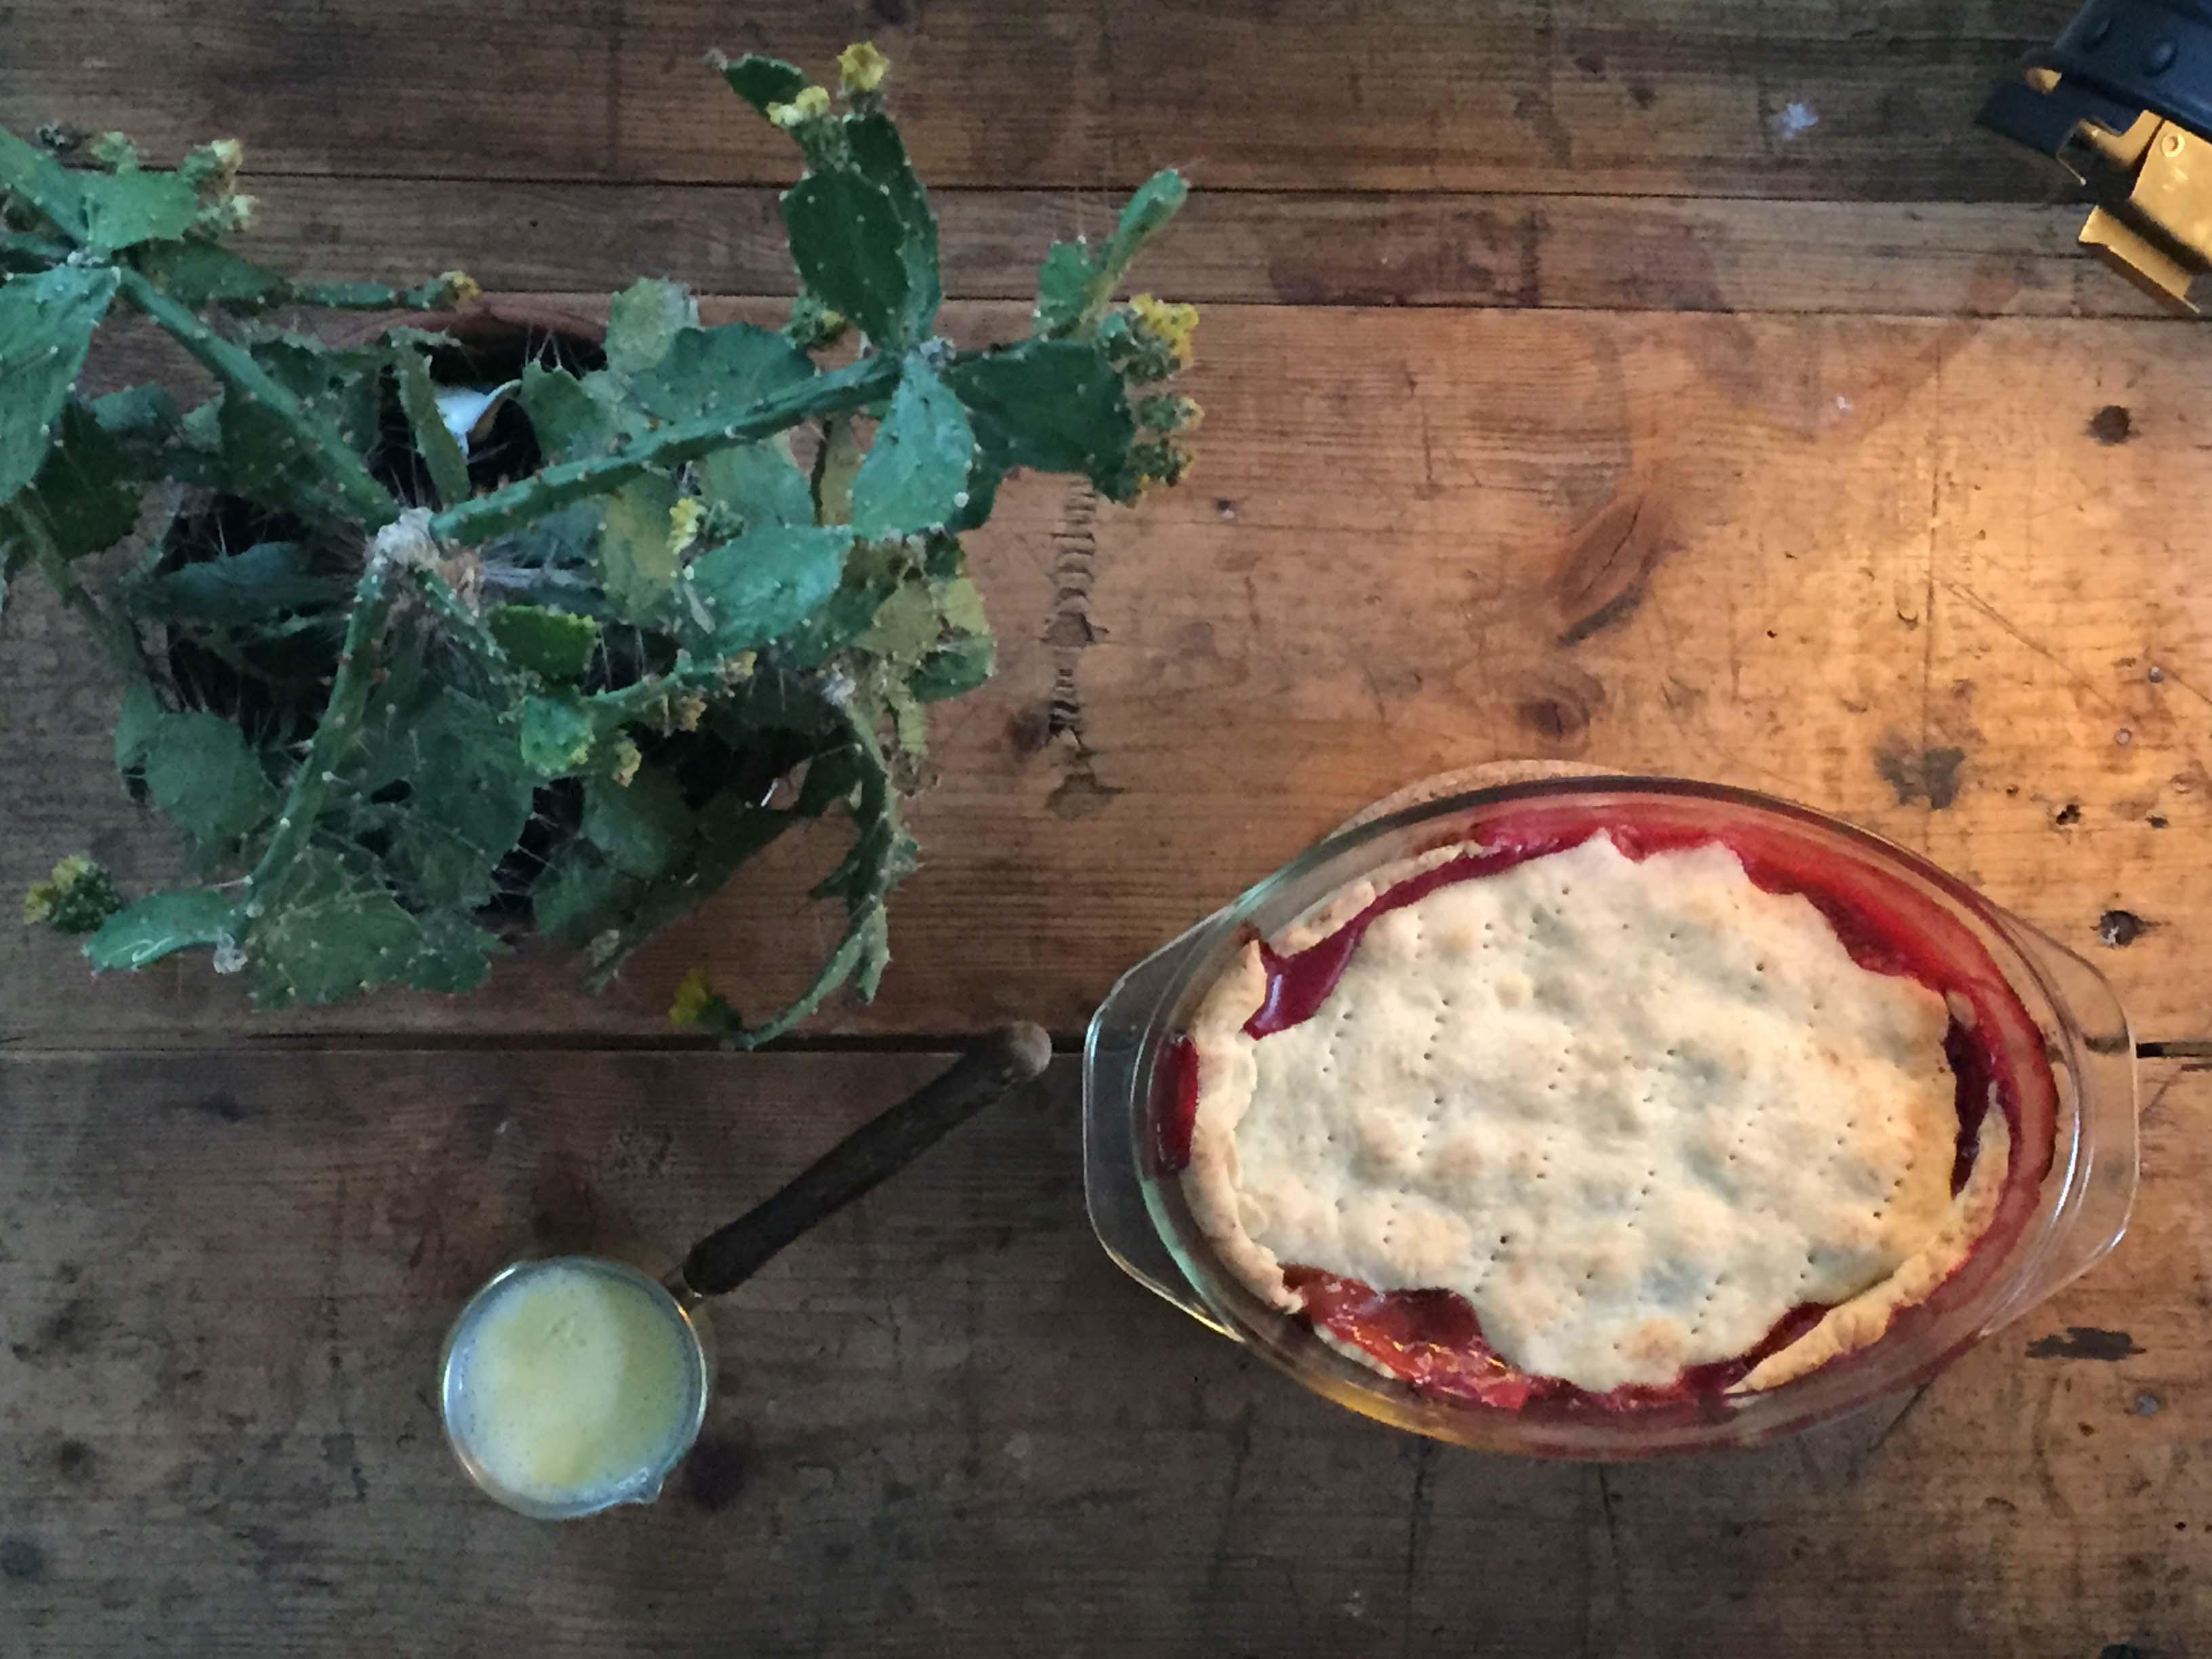 Metterschling's apple, rhubarb, rasberry pie